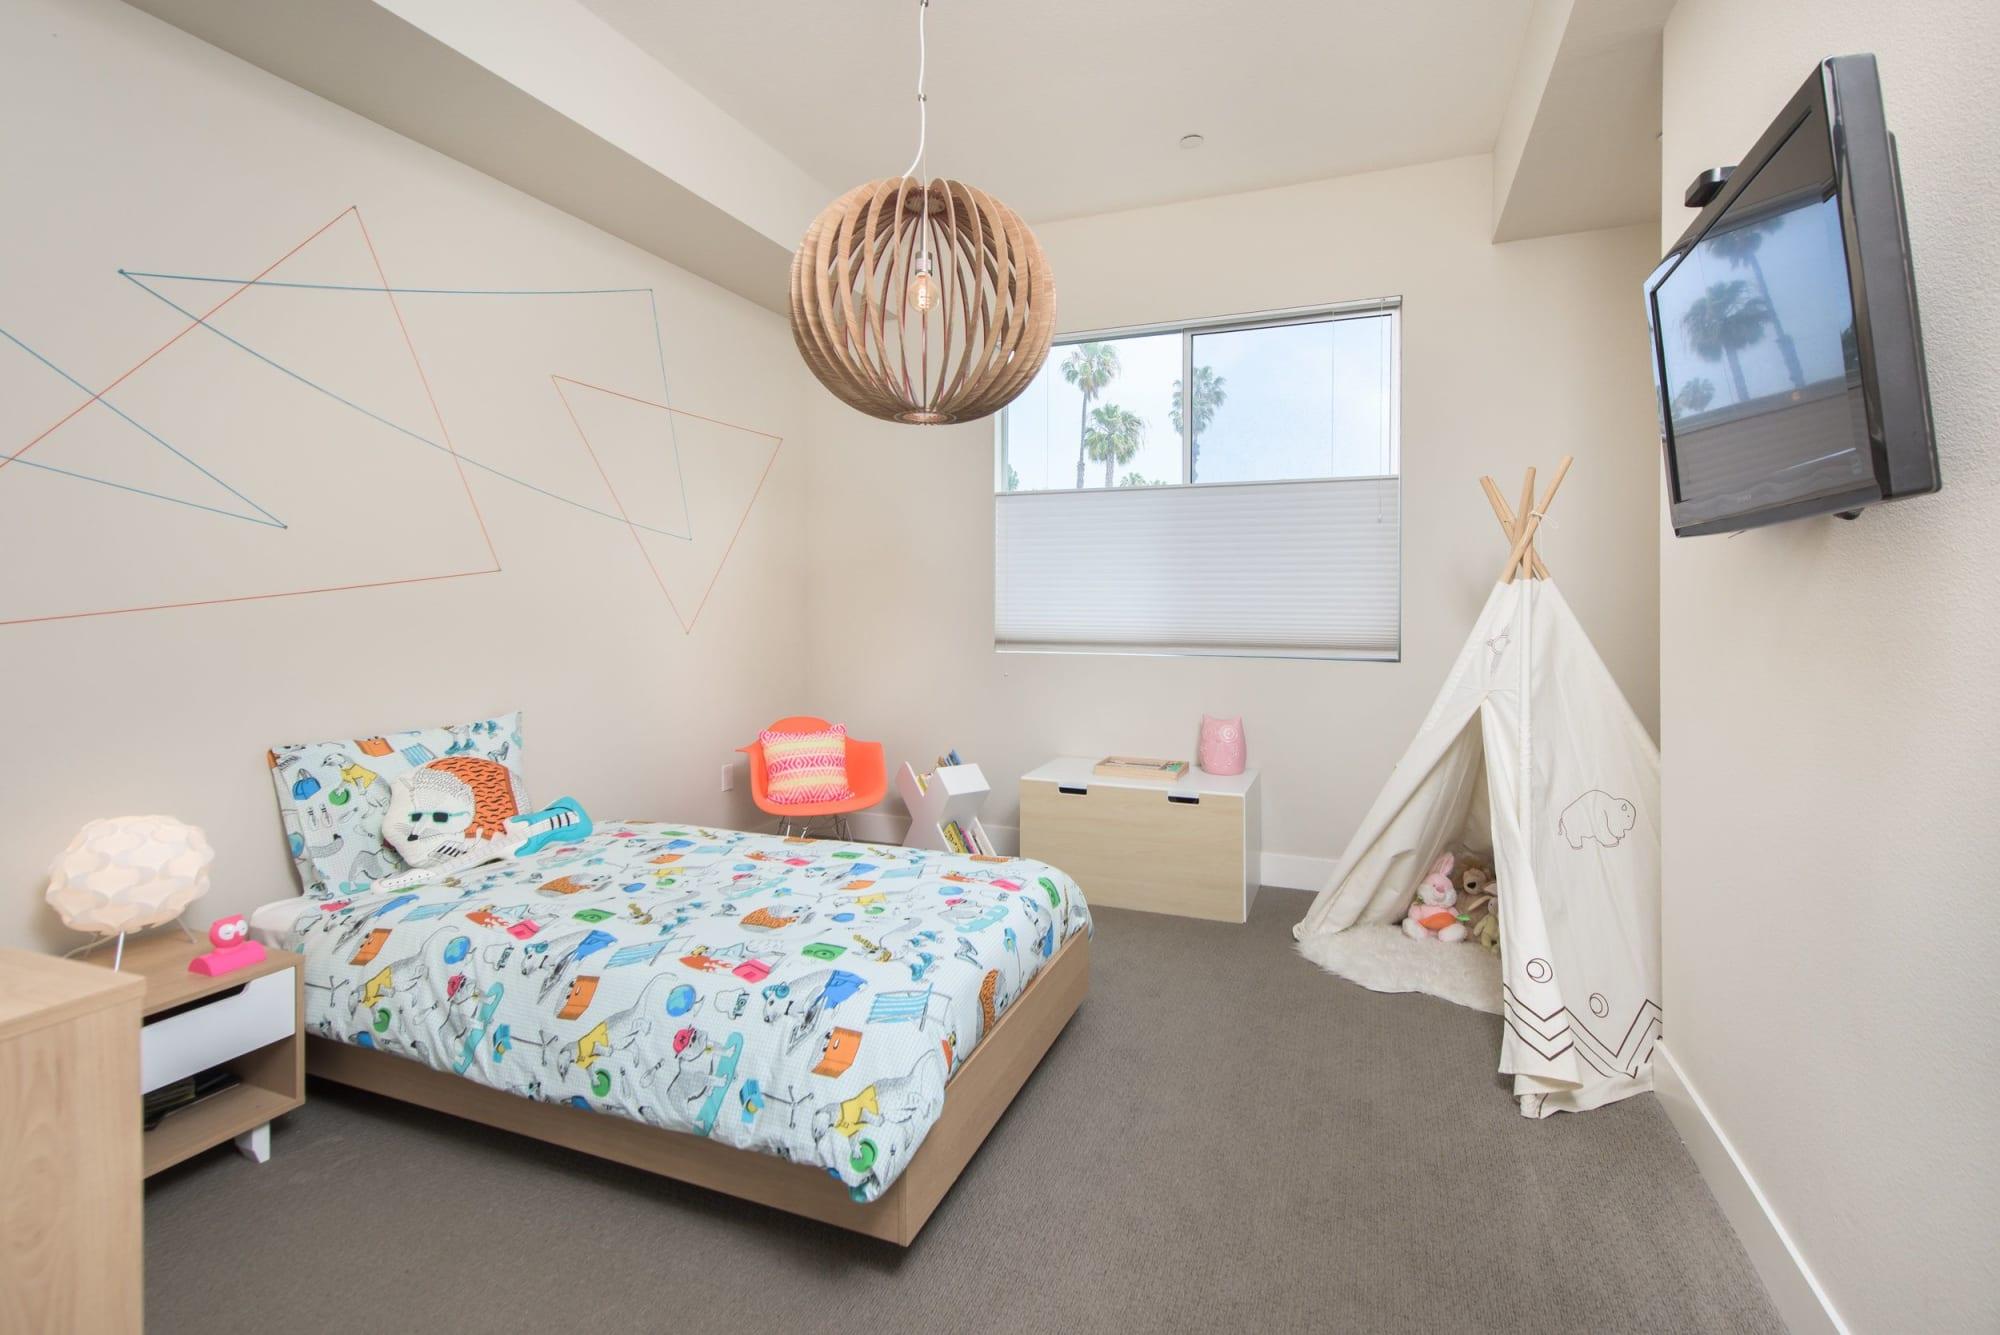 Interior Design by Popix Designs seen at Private Residence, Malibu - Malibu Family Home